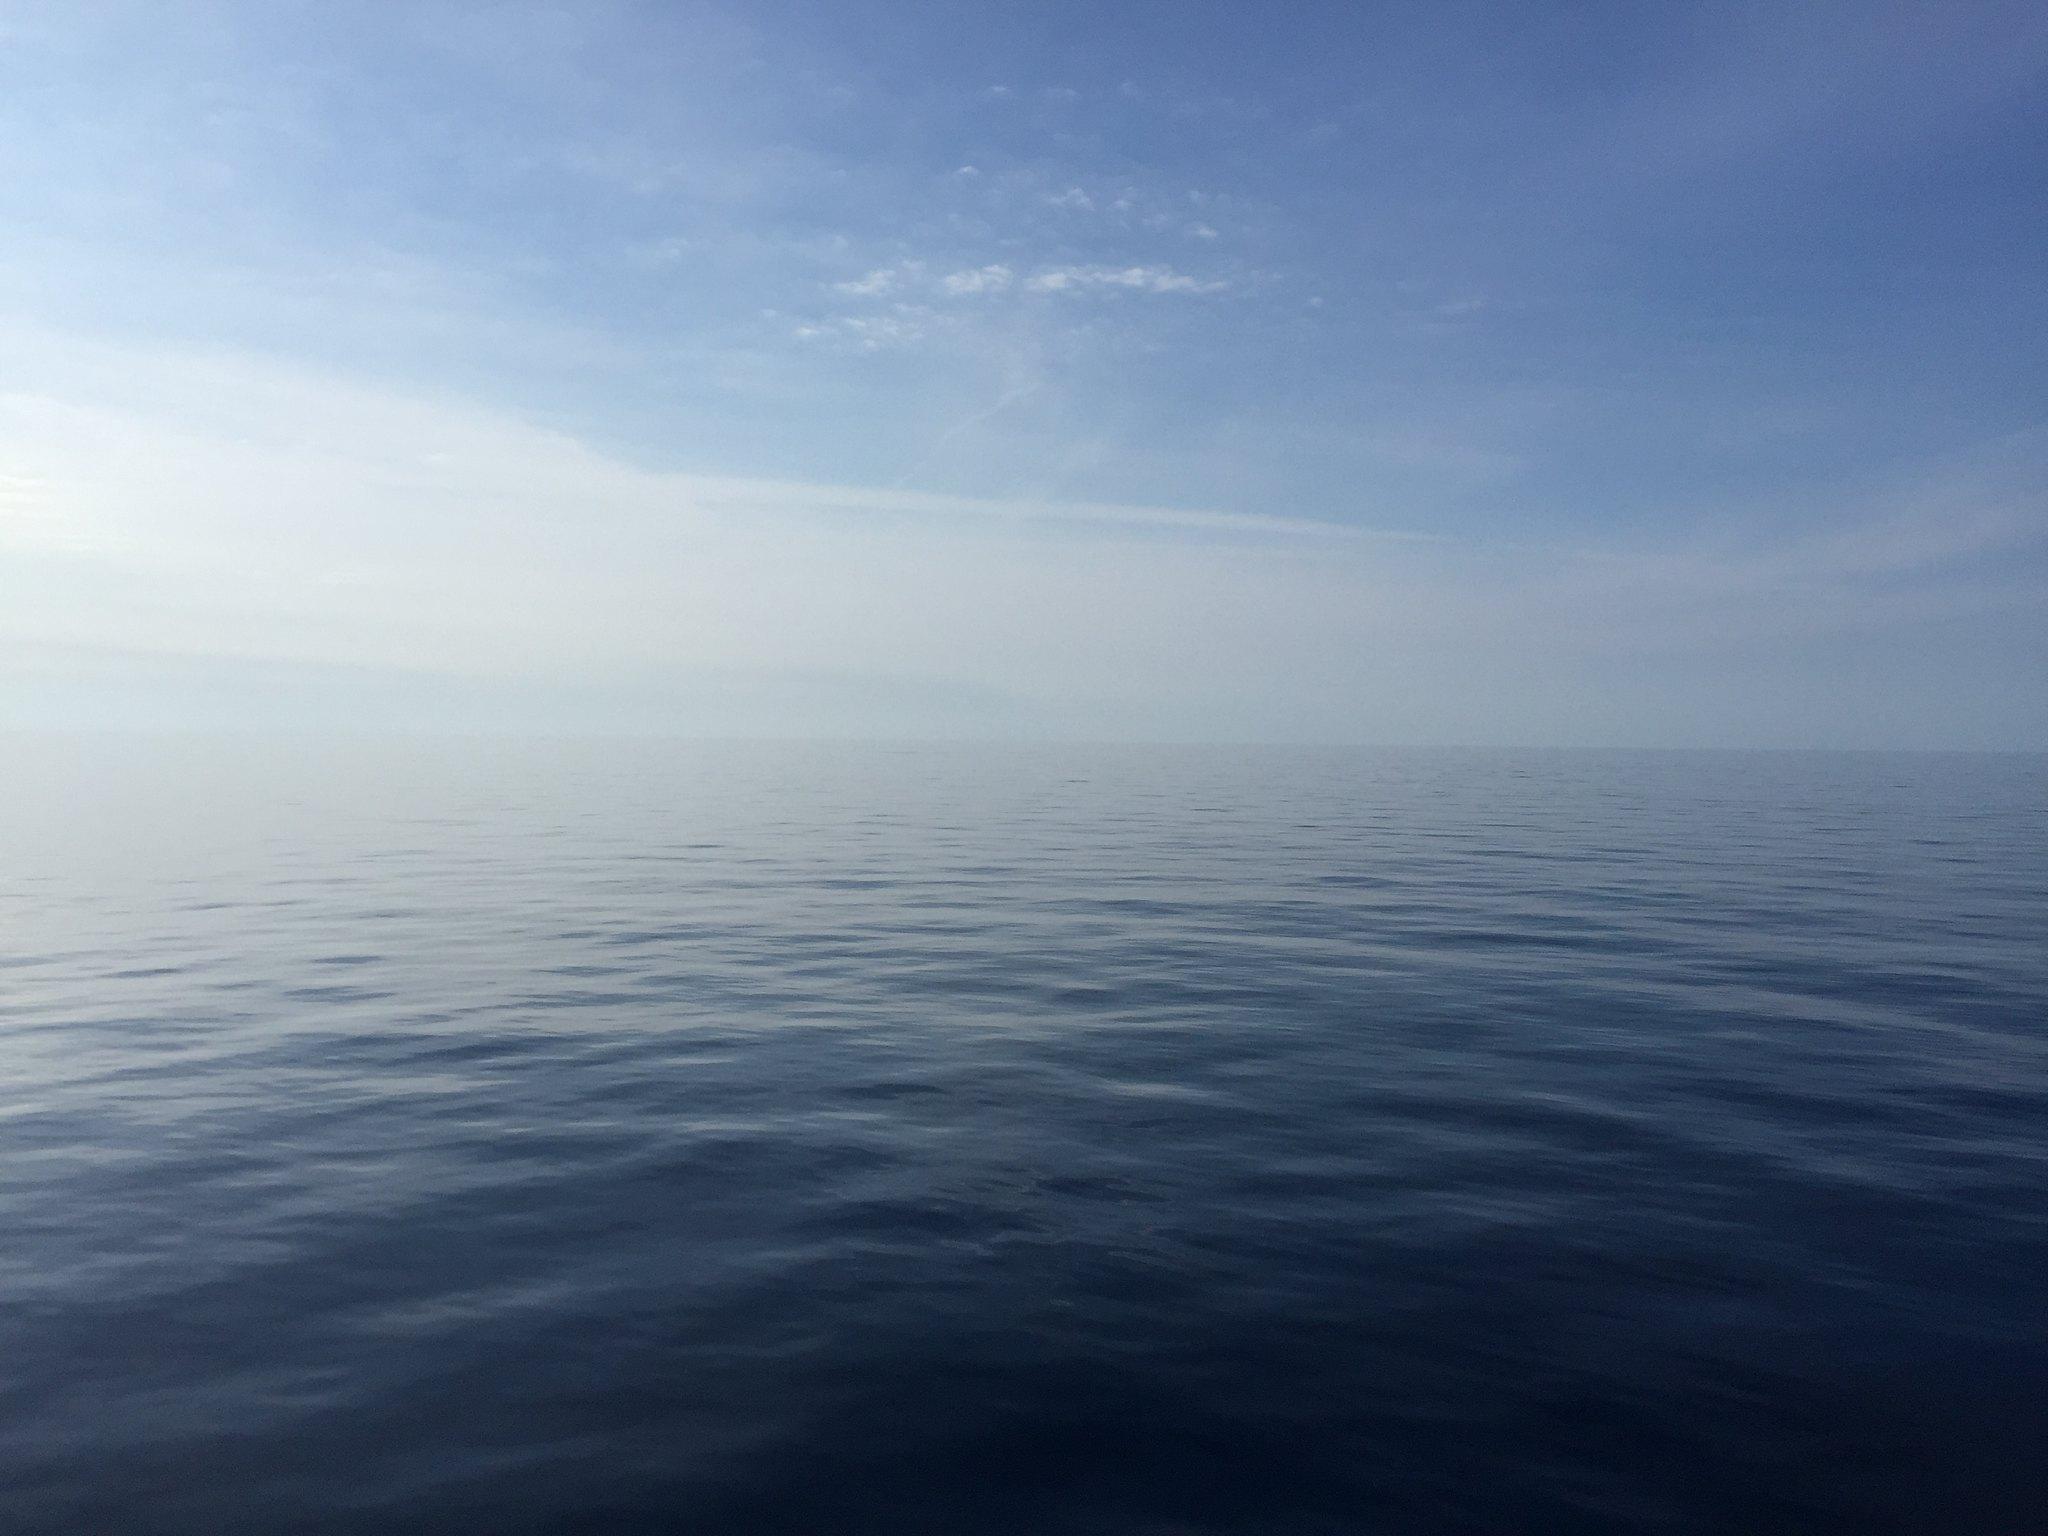 [OC] Mediterranean Serenity [3264x2448]